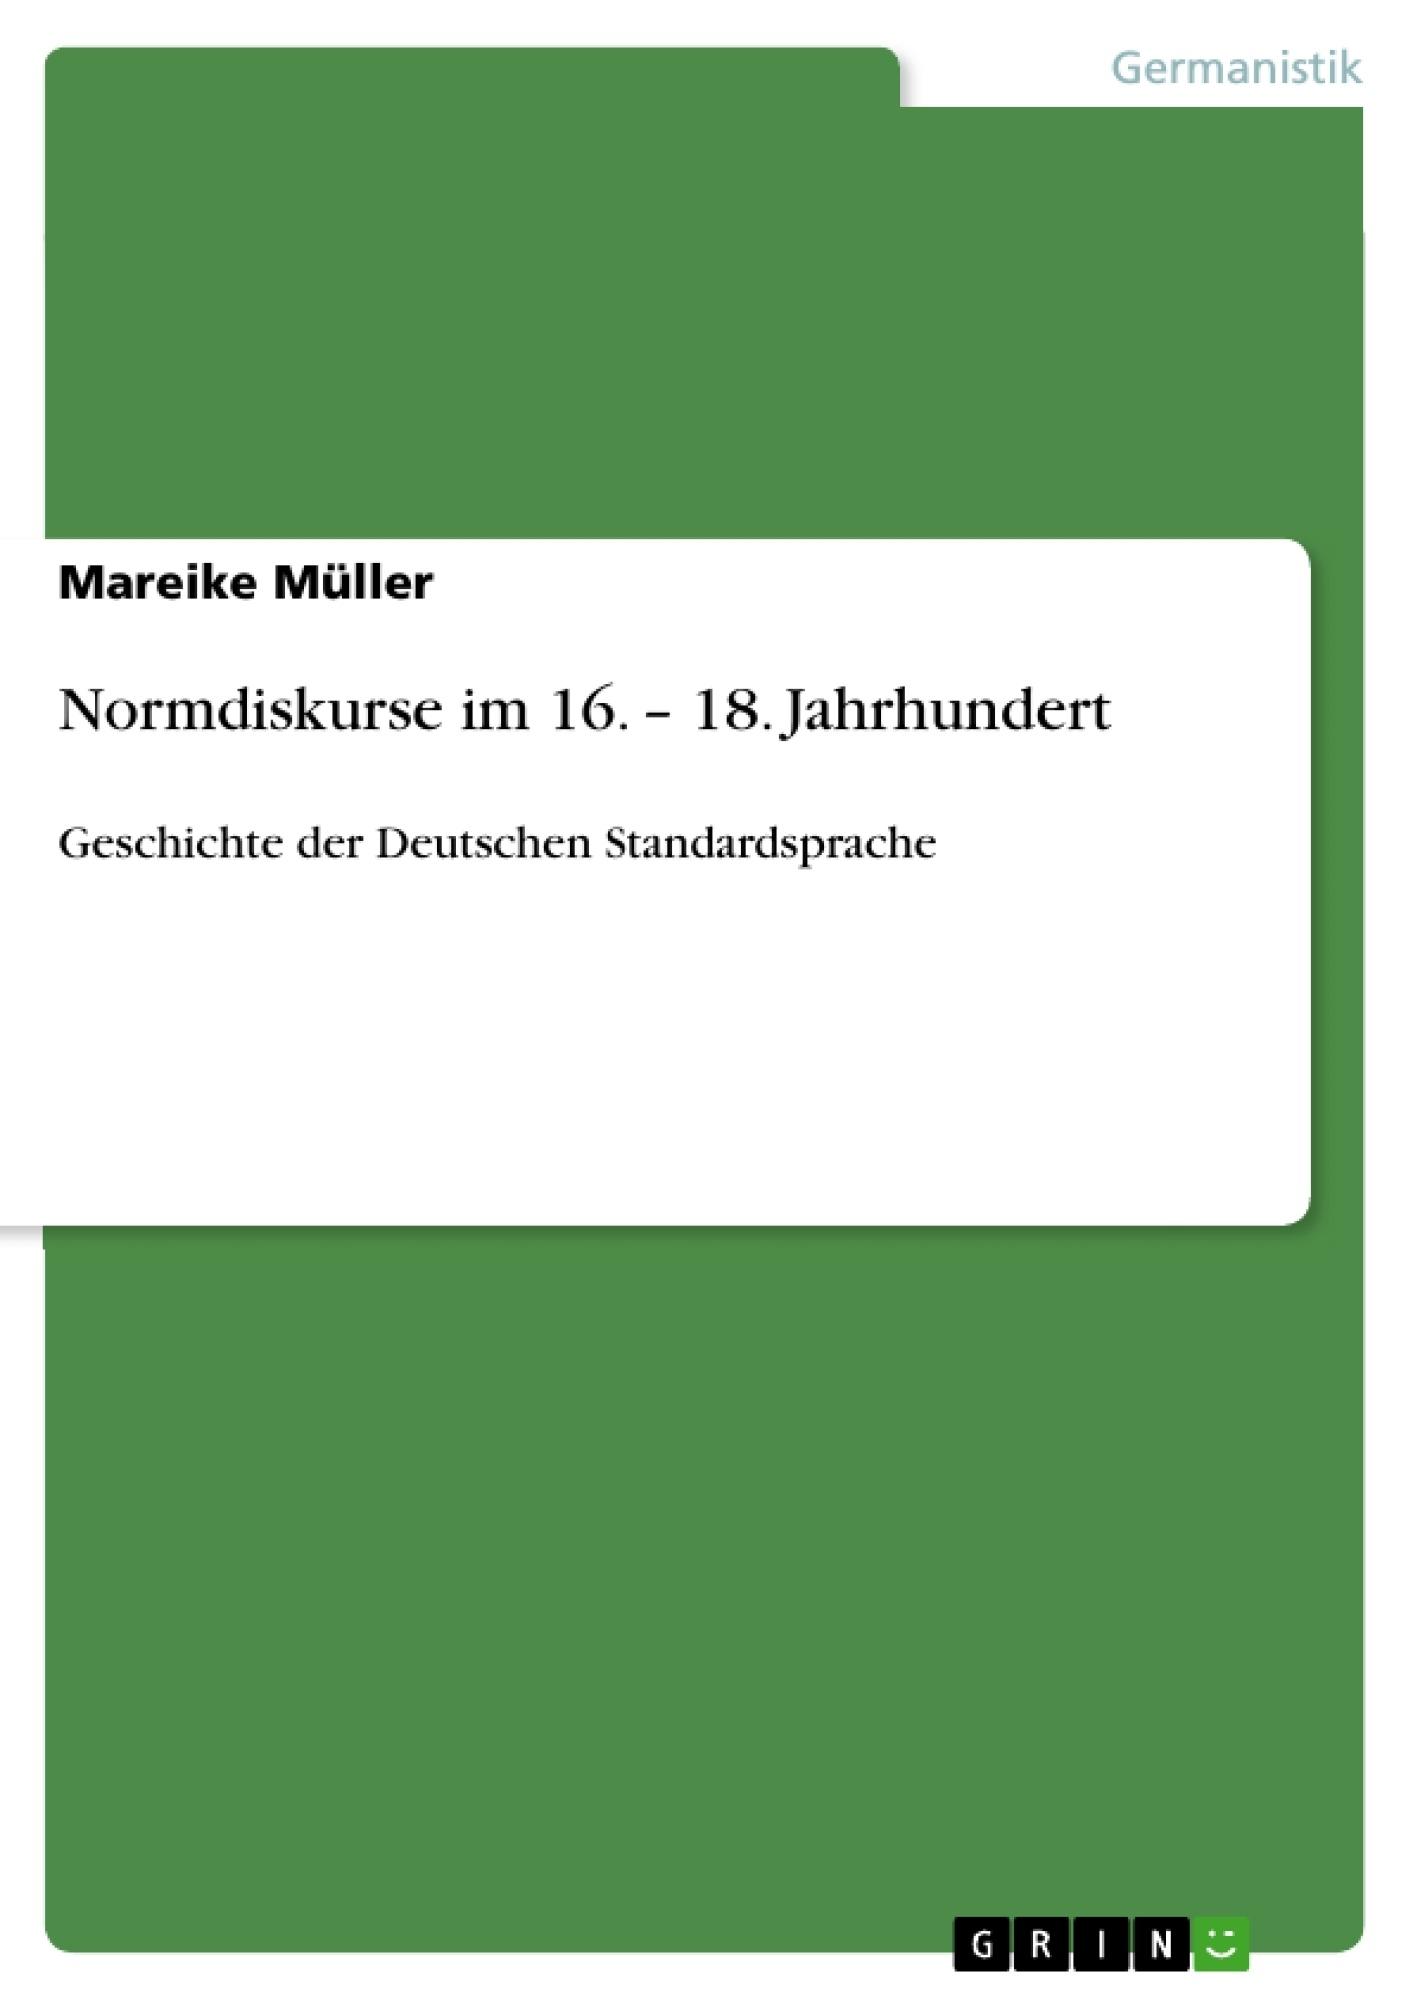 Titel: Normdiskurse im 16. – 18. Jahrhundert